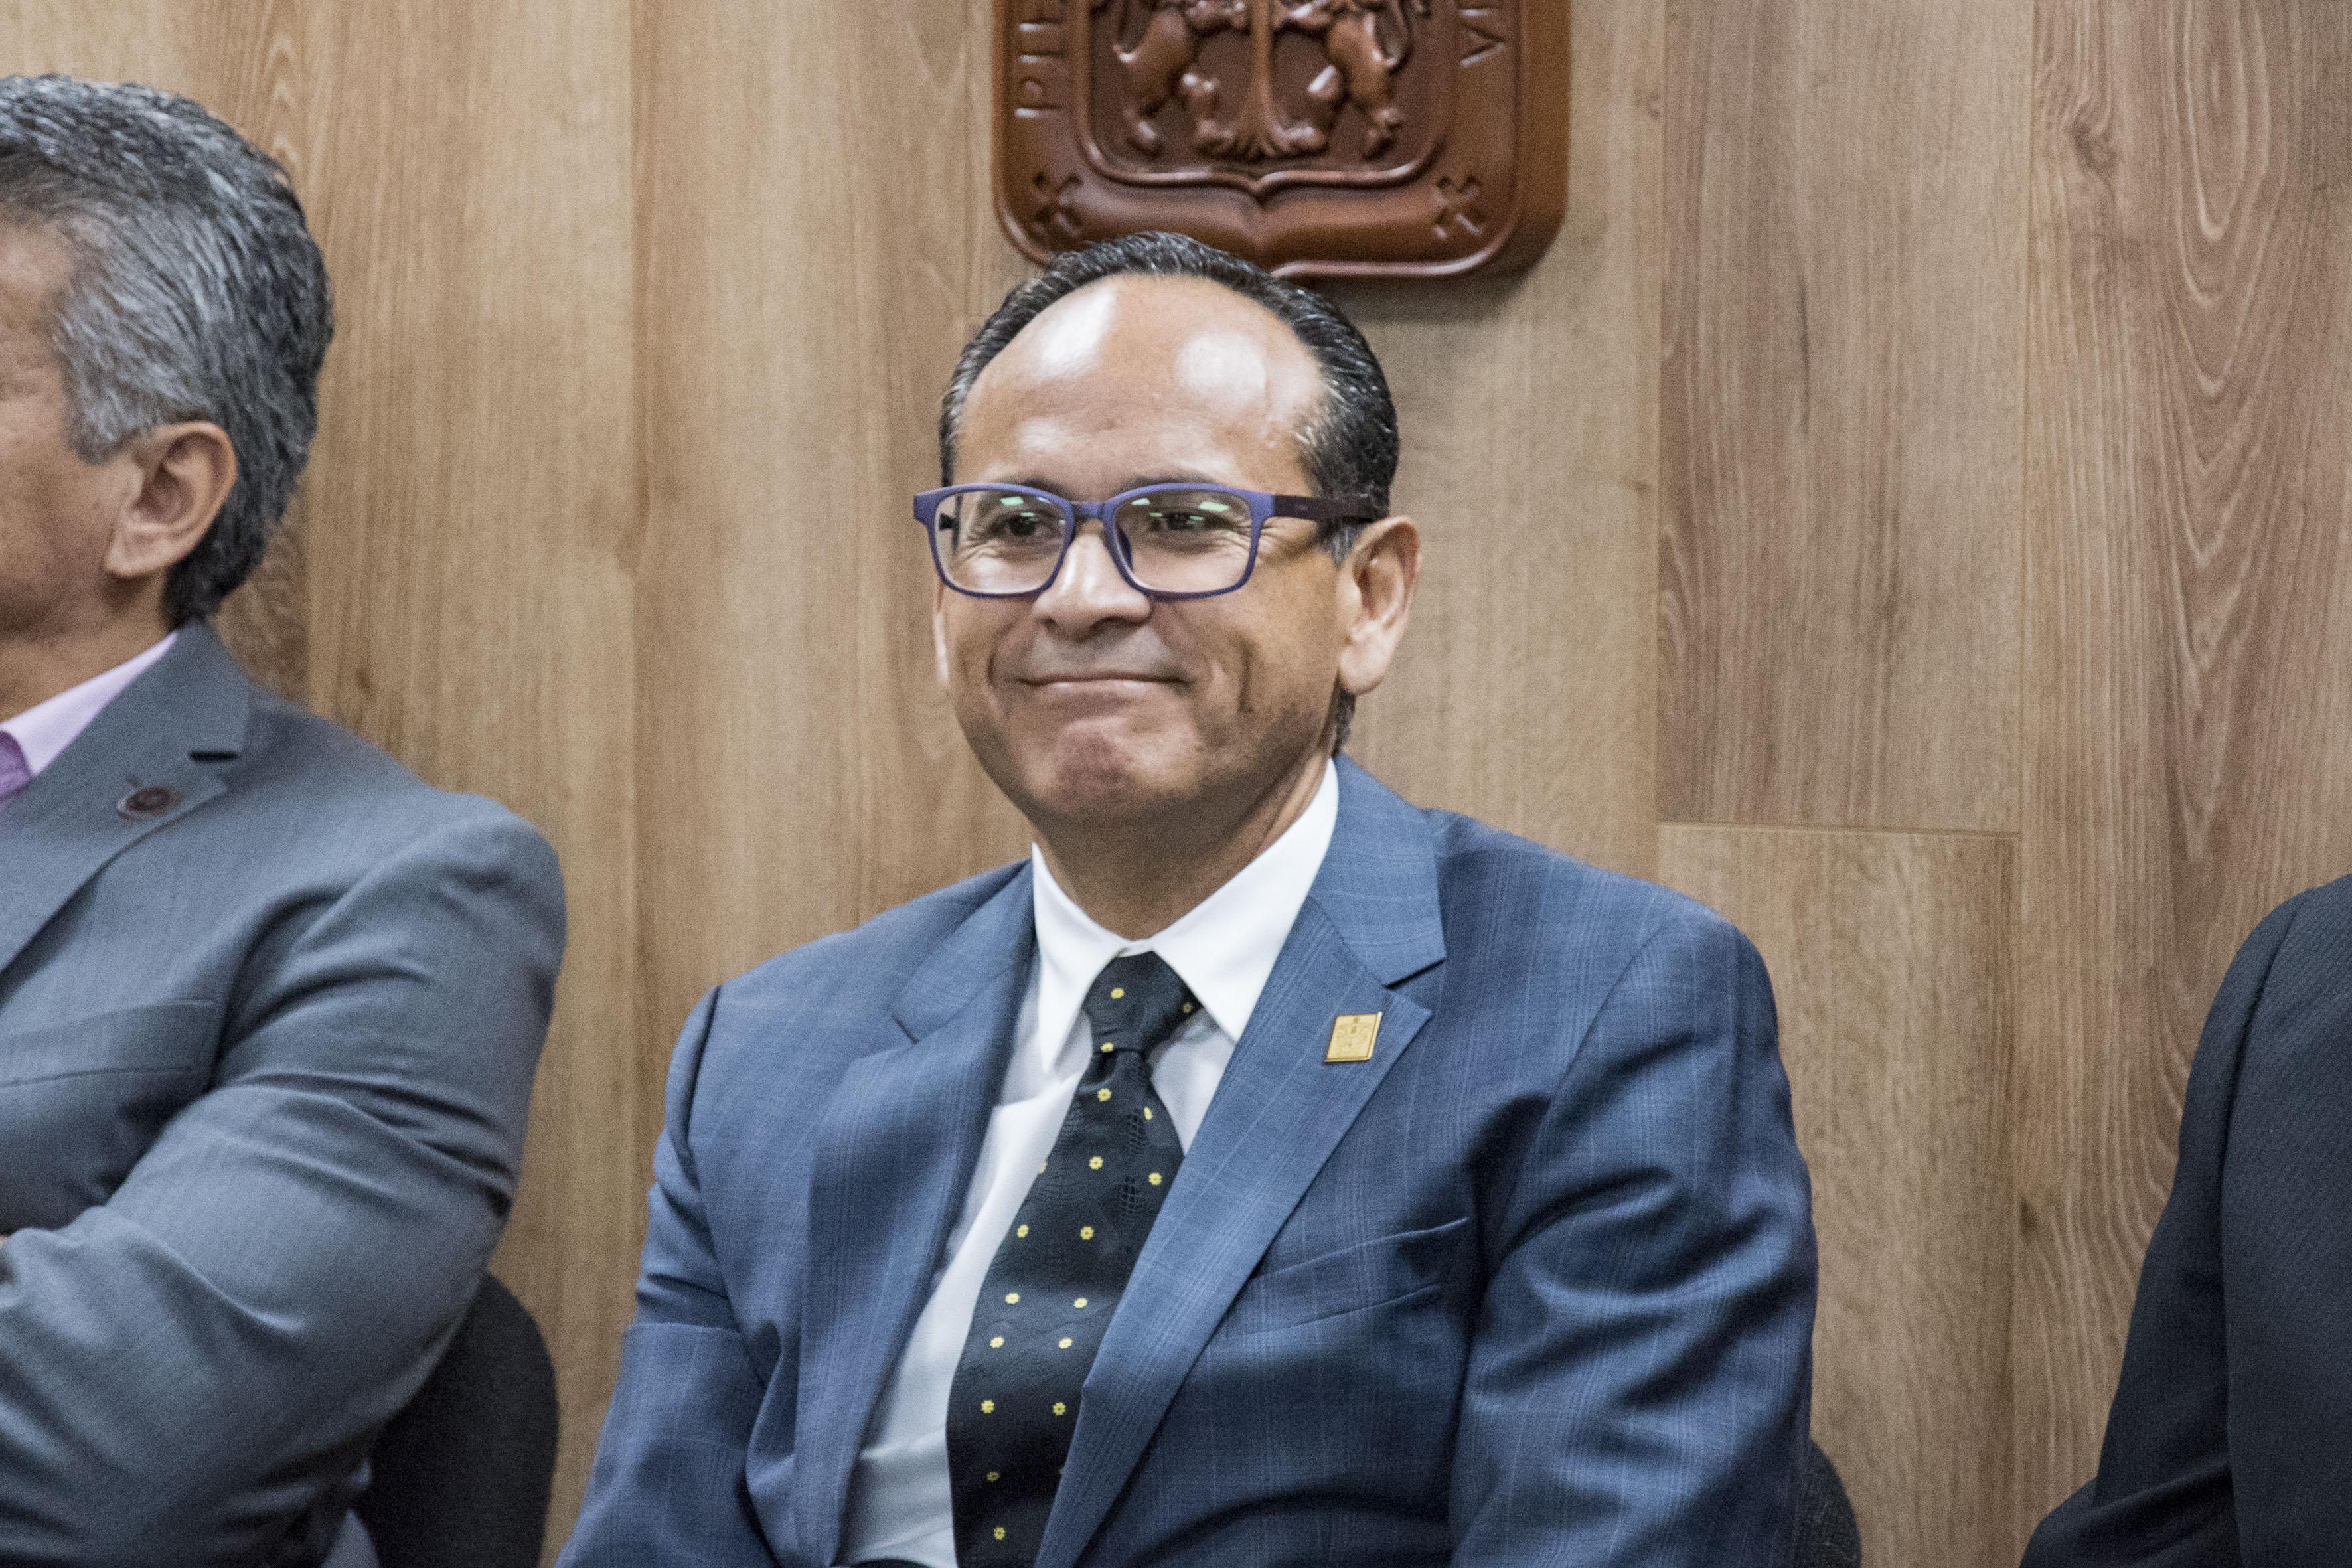 Doctor Hector Raul Perez Gomez